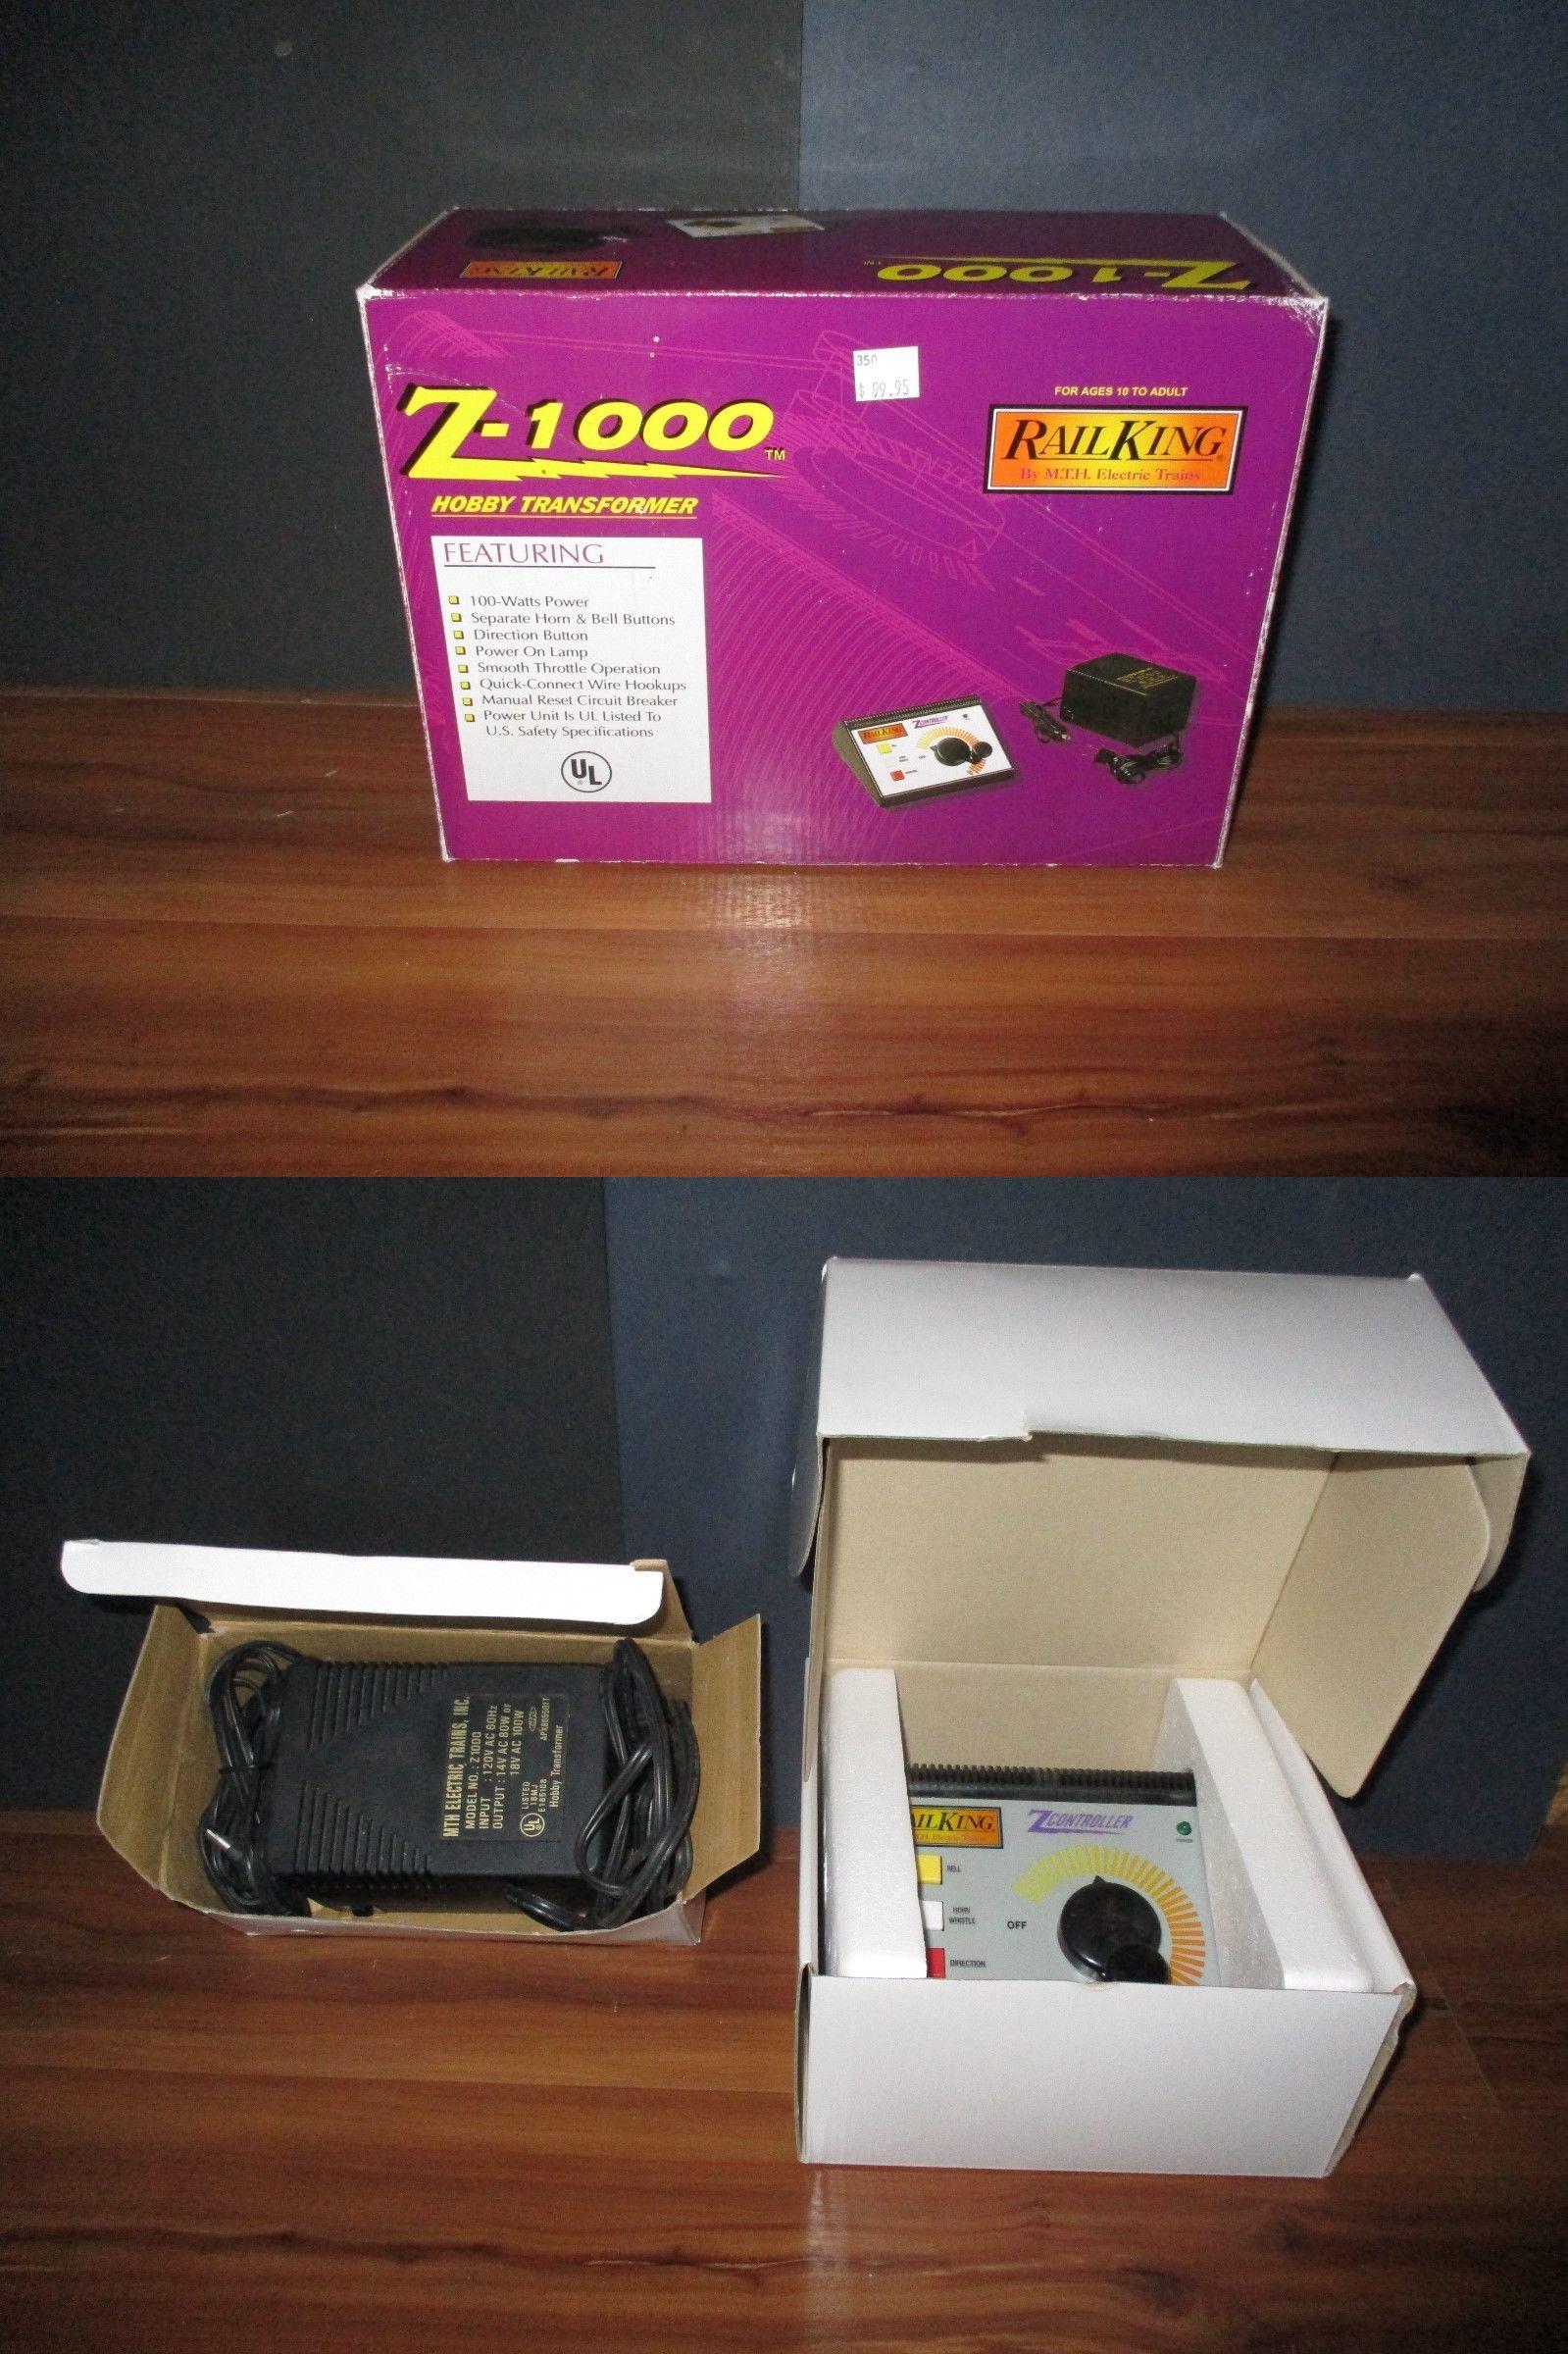 Transformers 180344 Rail King Z 1000 Transformer Item 40 Circuit Breaker Labels Ebay Transformerskingebay